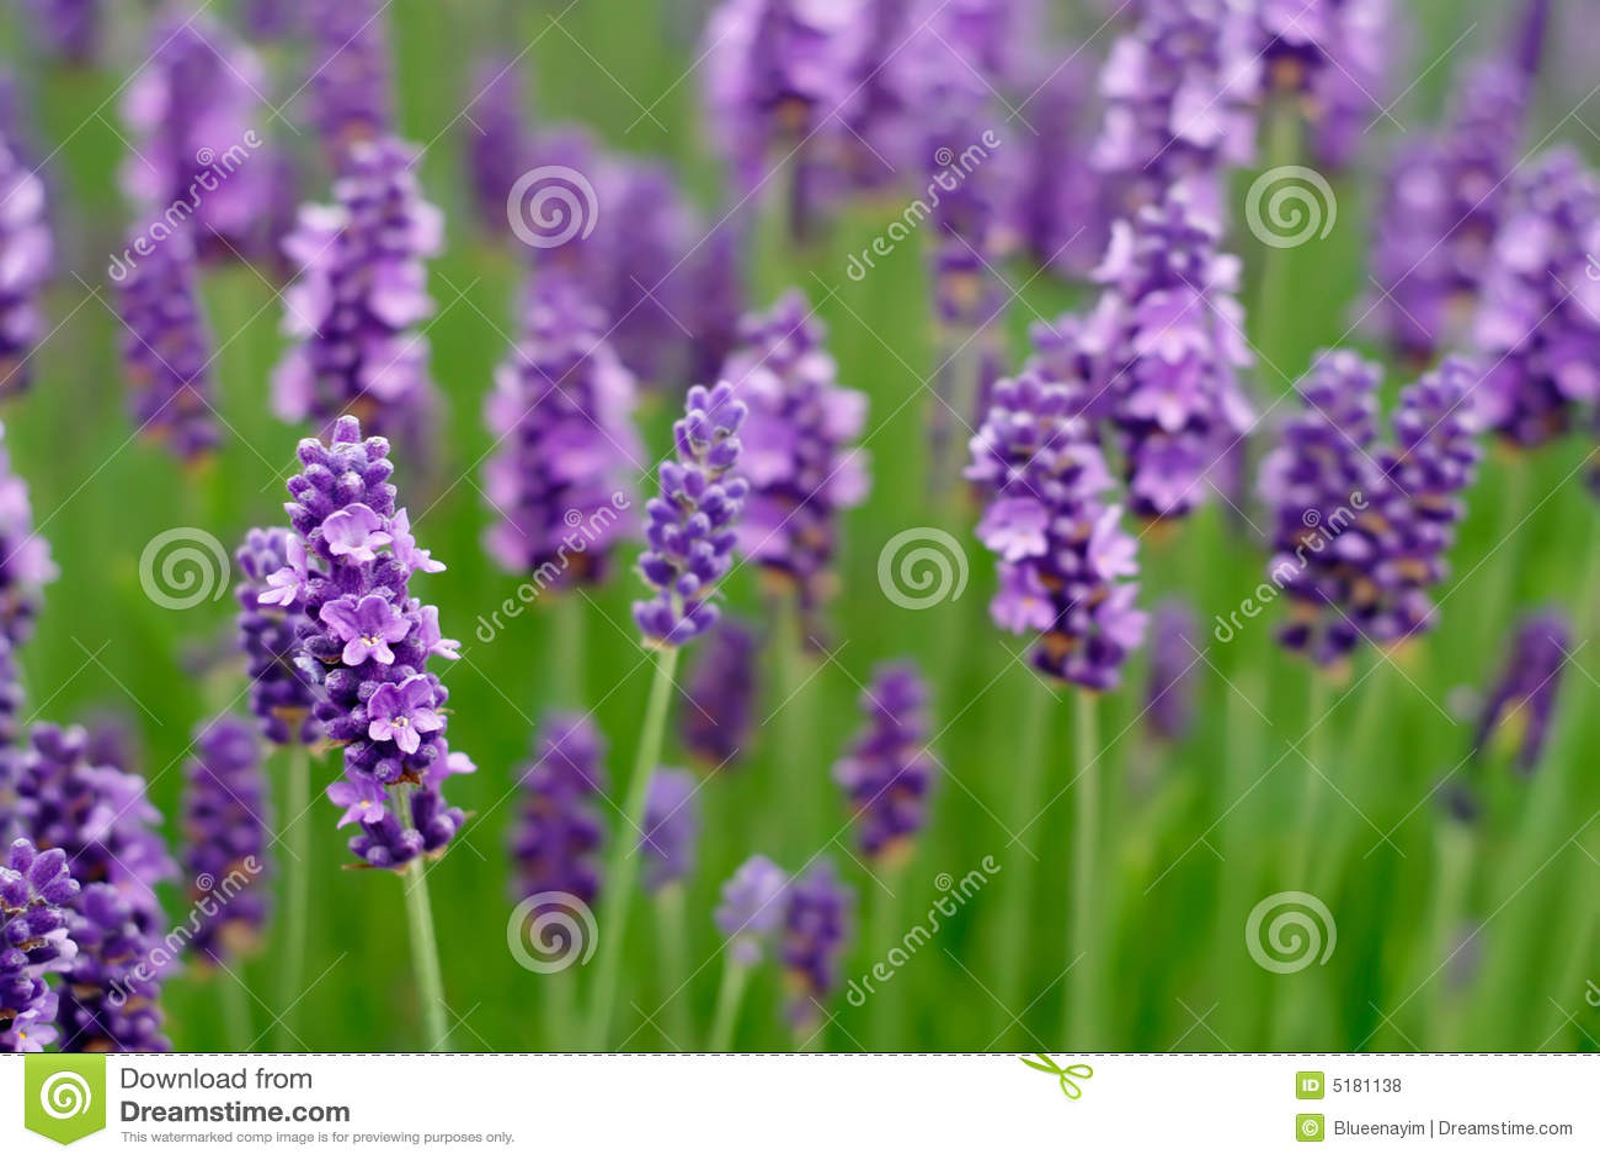 Lavendel-Blumen